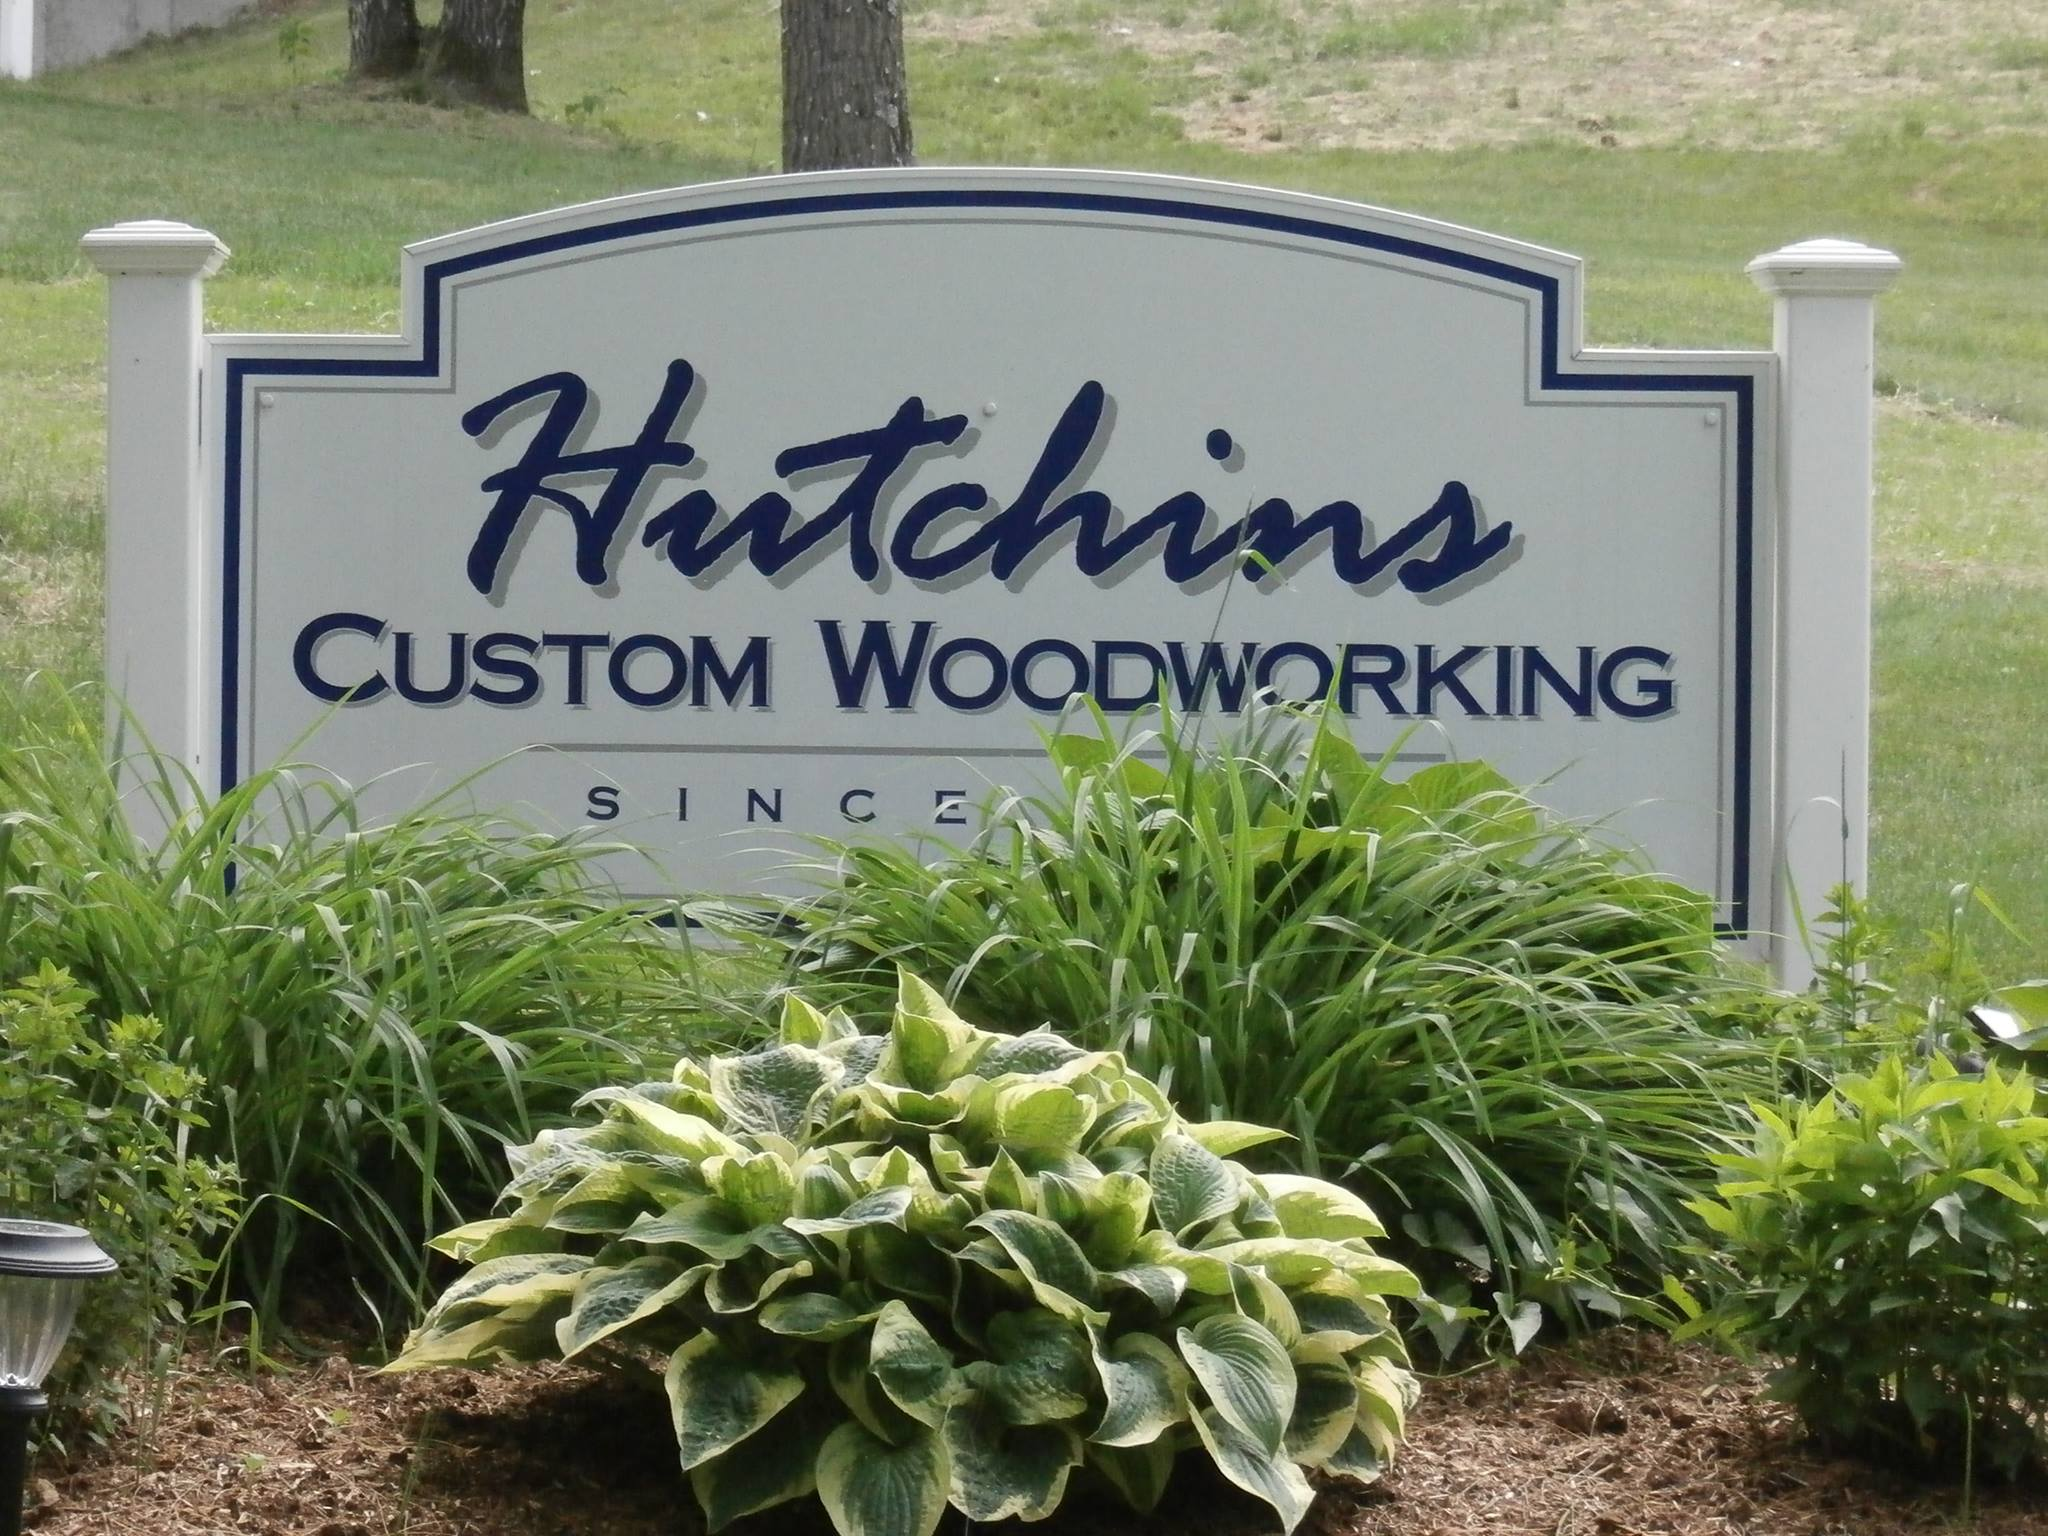 Hutchins custom woodworking.jpg